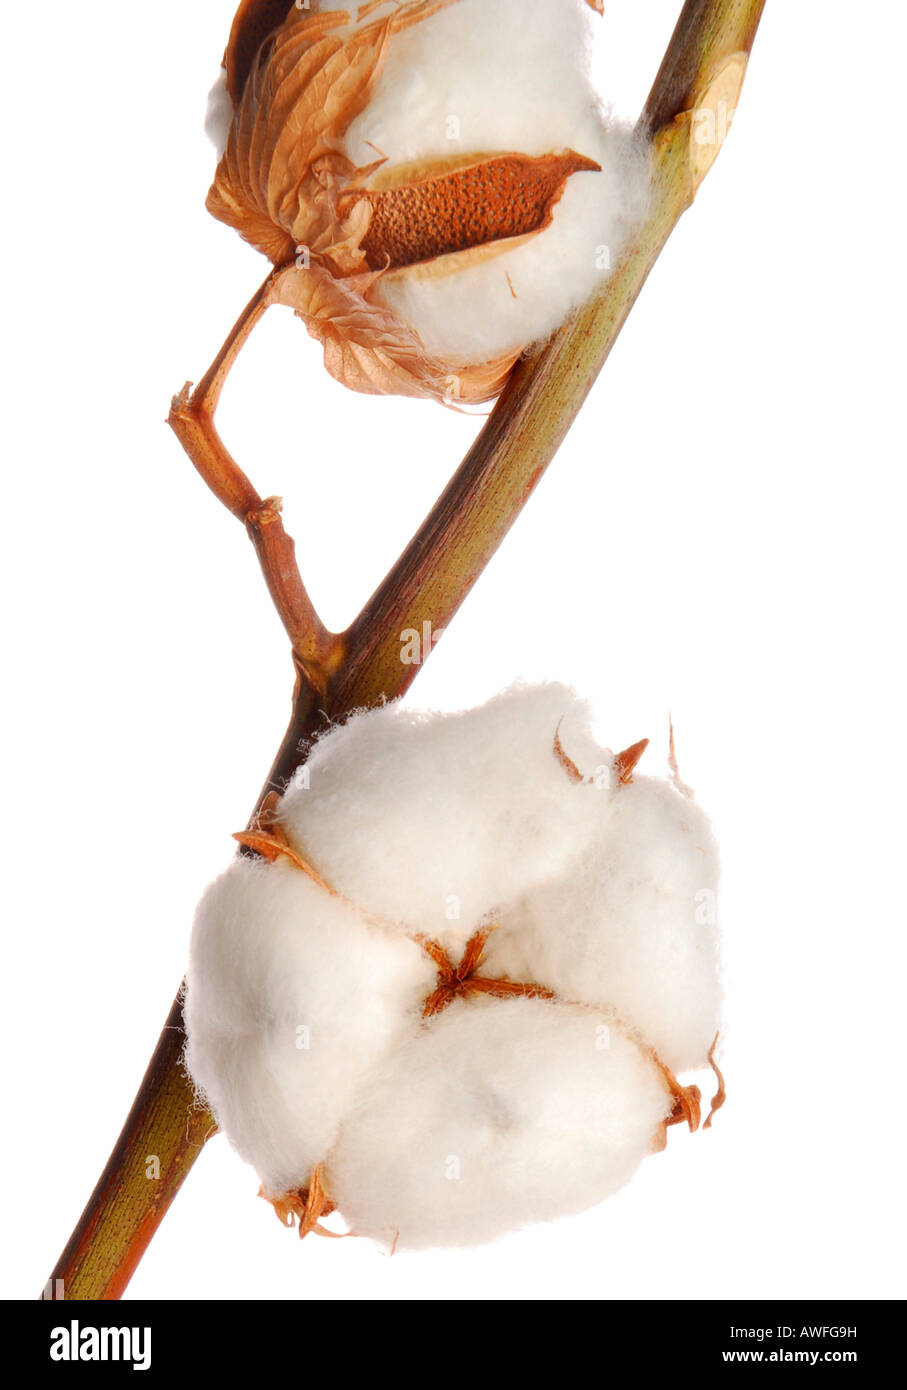 Cotton - Stock Image